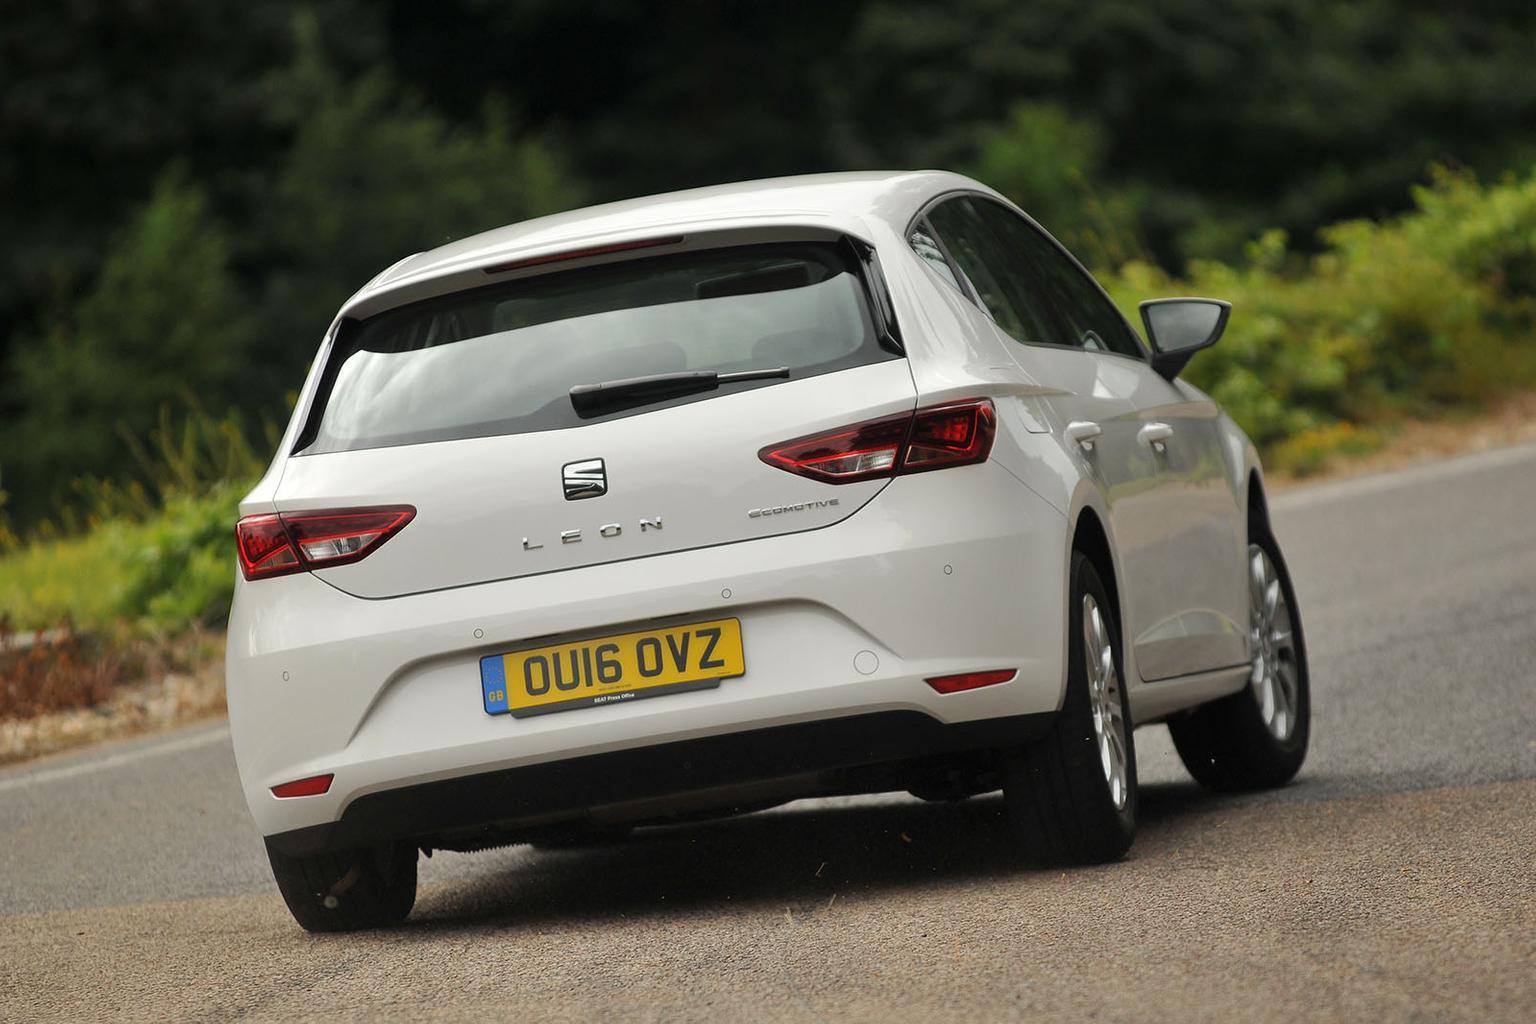 New Renault Megane vs Seat Leon vs Vauxhall Astra